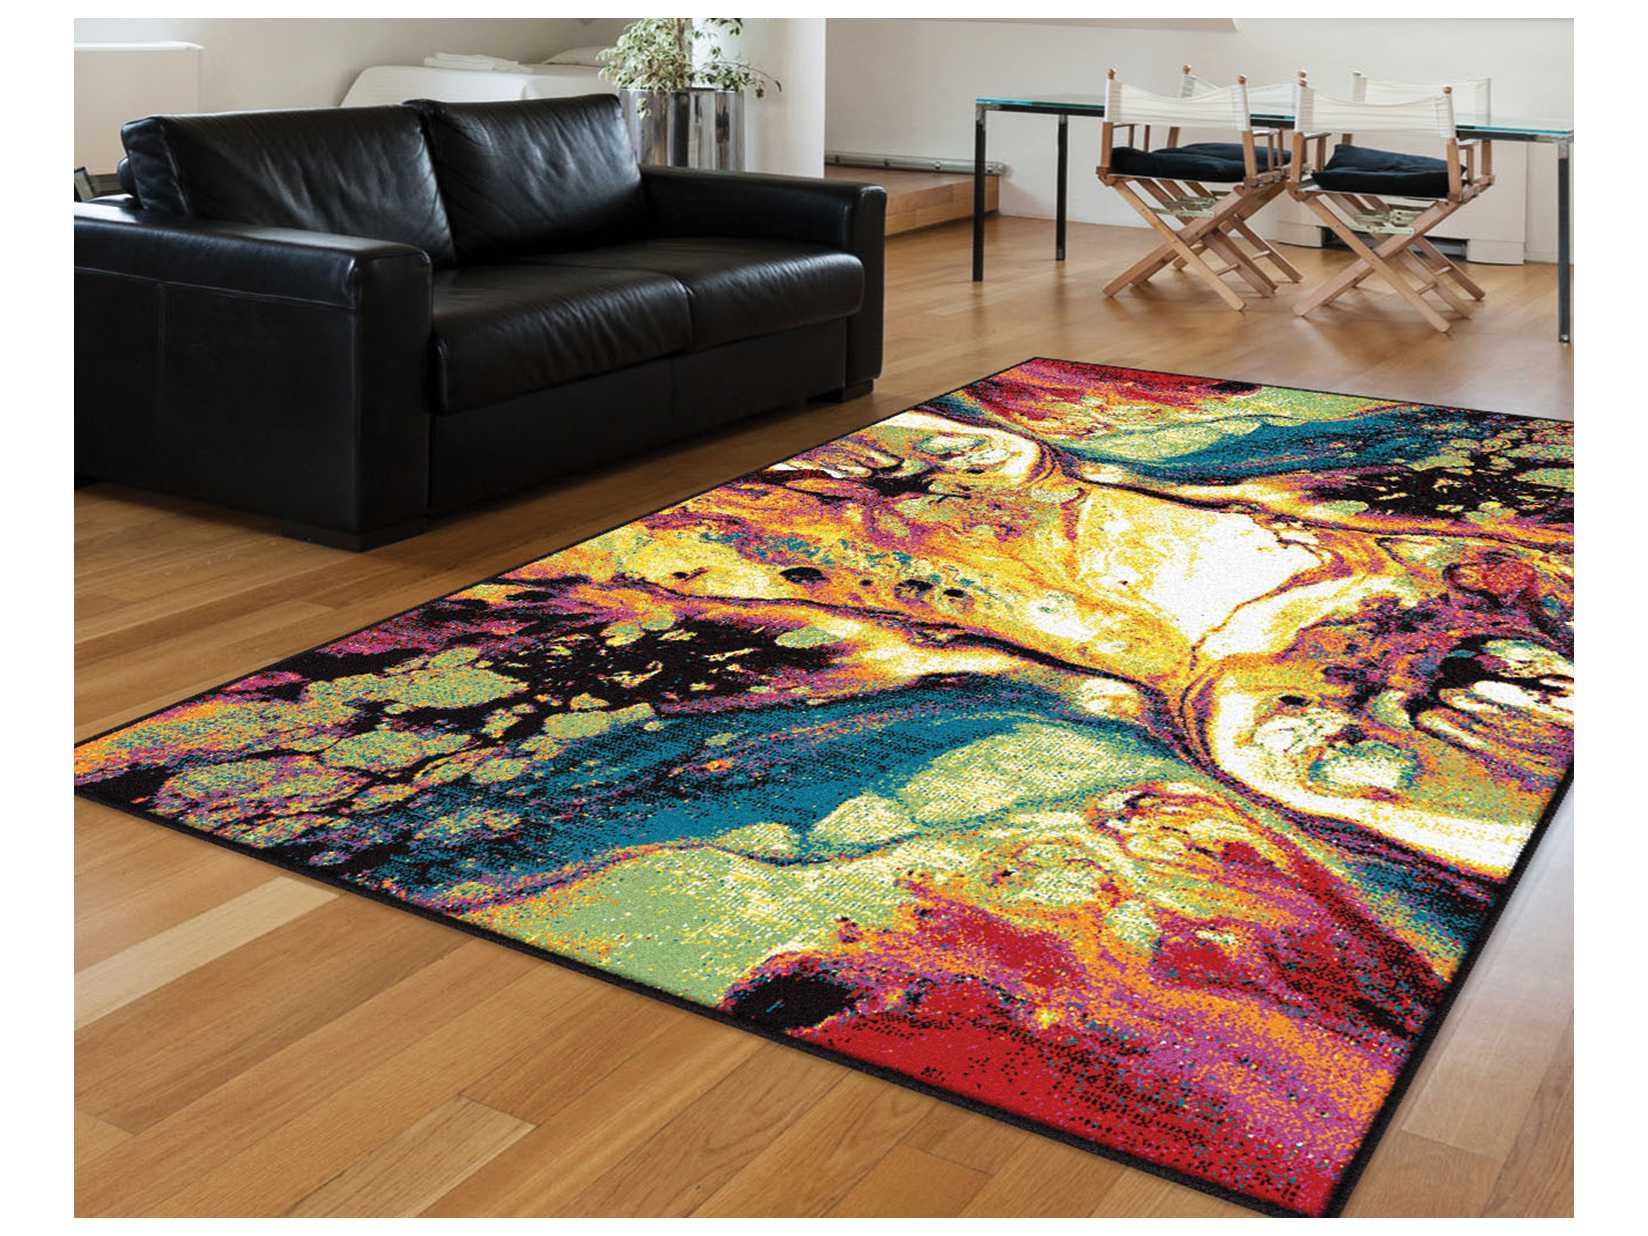 modern style adirondack chairs ikea futon chair bed tayse rugs symphony soleil rectangular multi-color area rug | tasmp1004multi